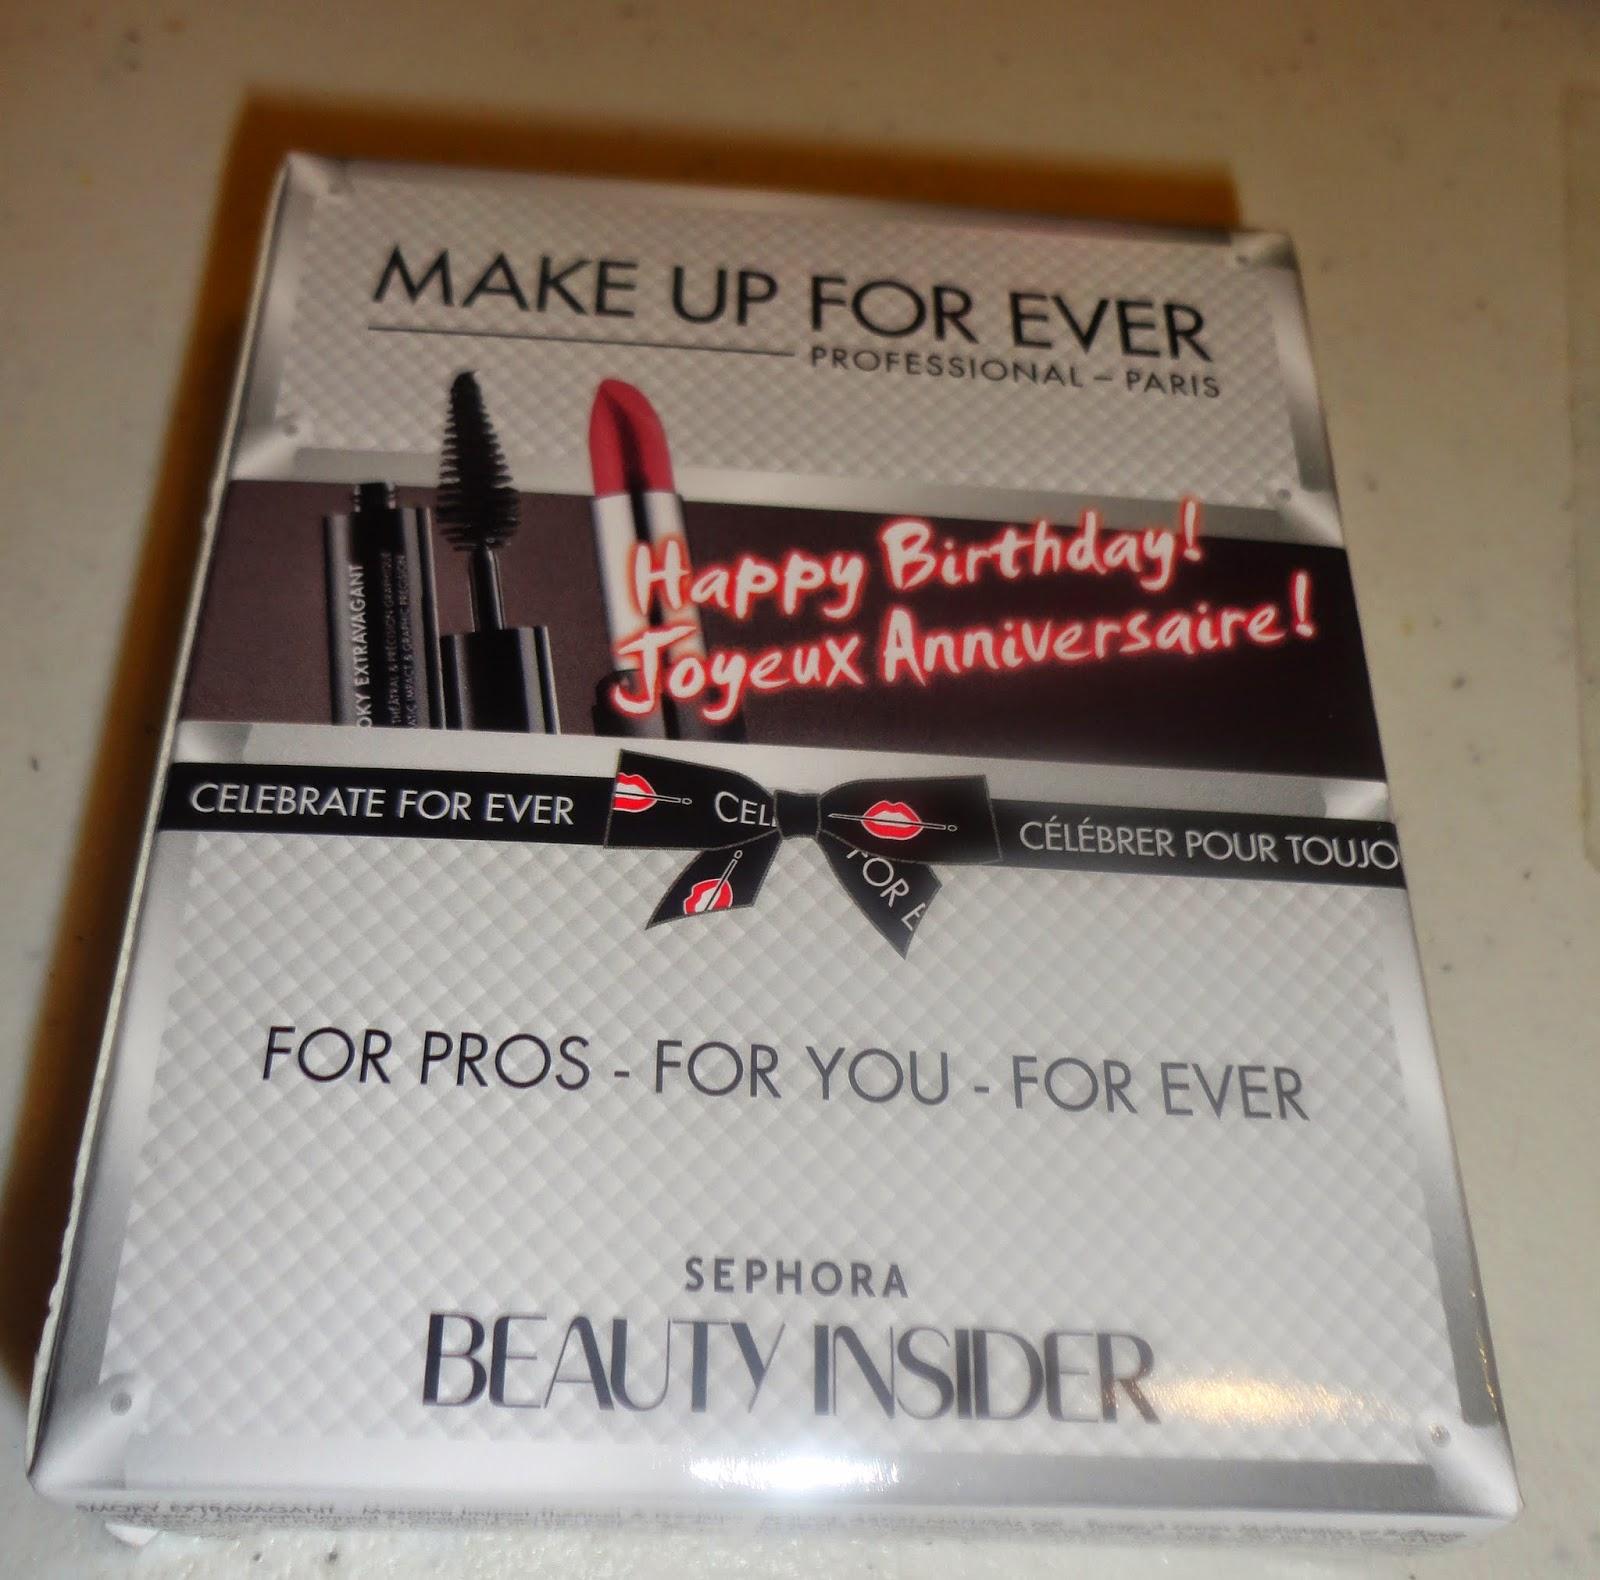 Sephora Beauty Insider B'day Gift